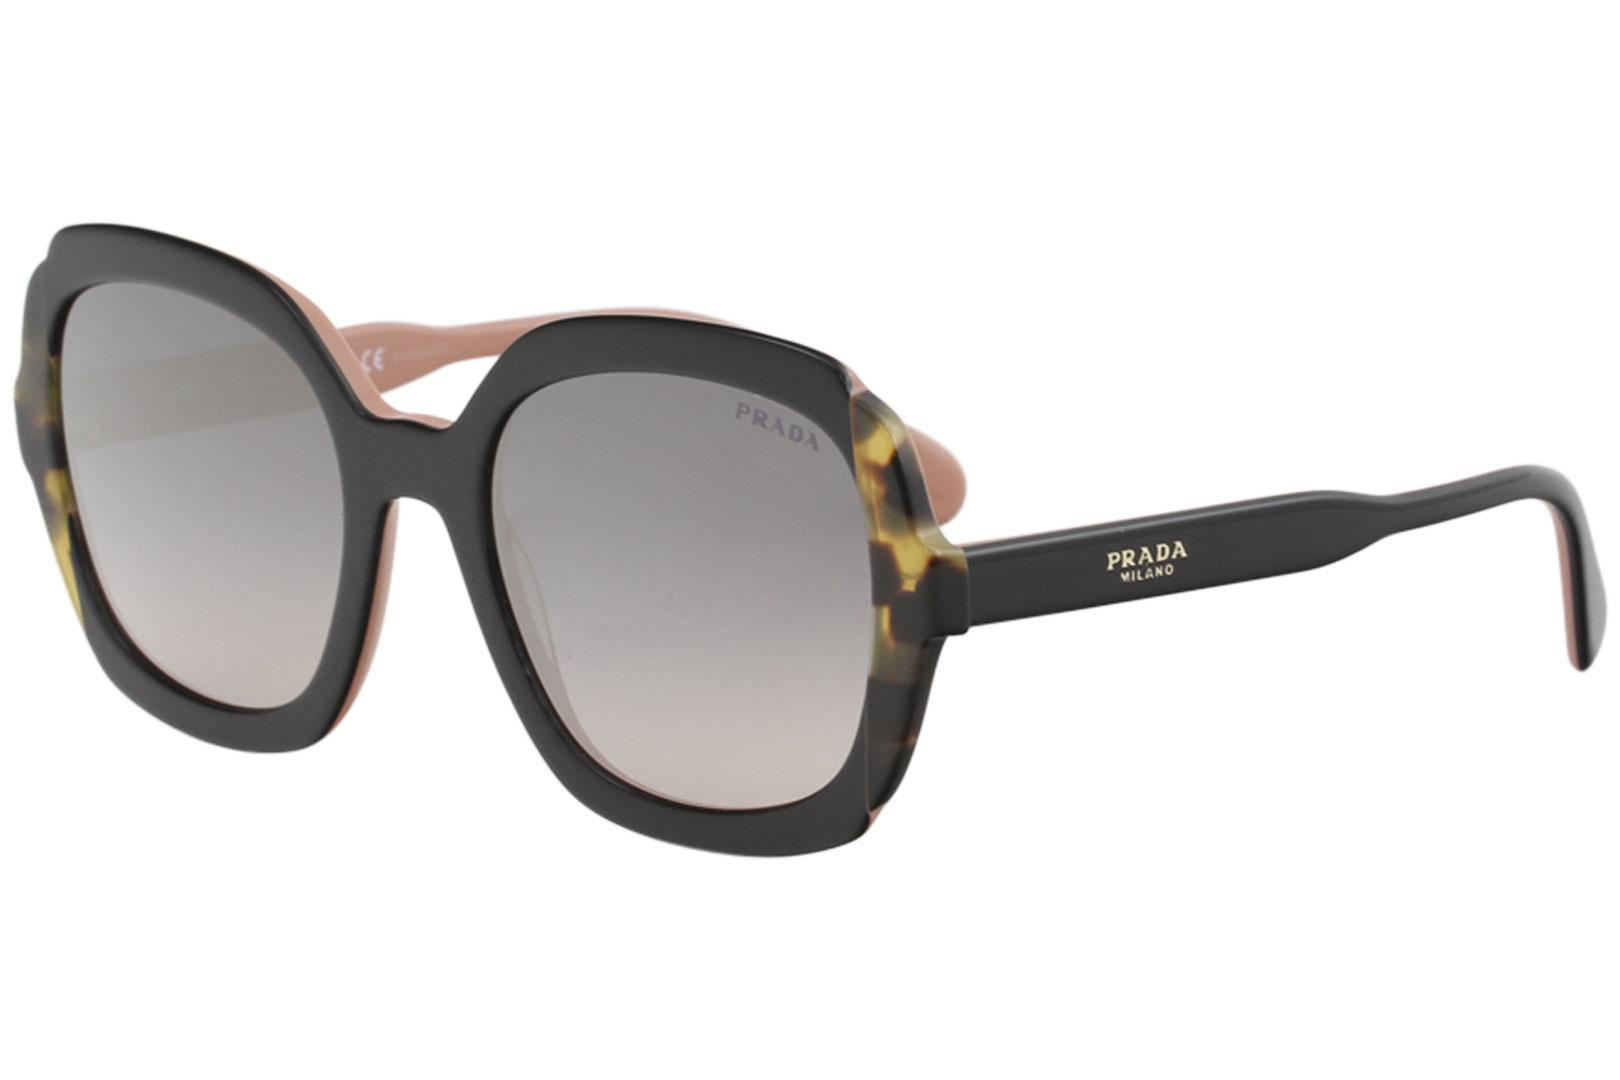 0c2a11ed13a6b Prada Women s SPR16U SPR 16U Fashion Square Sunglasses